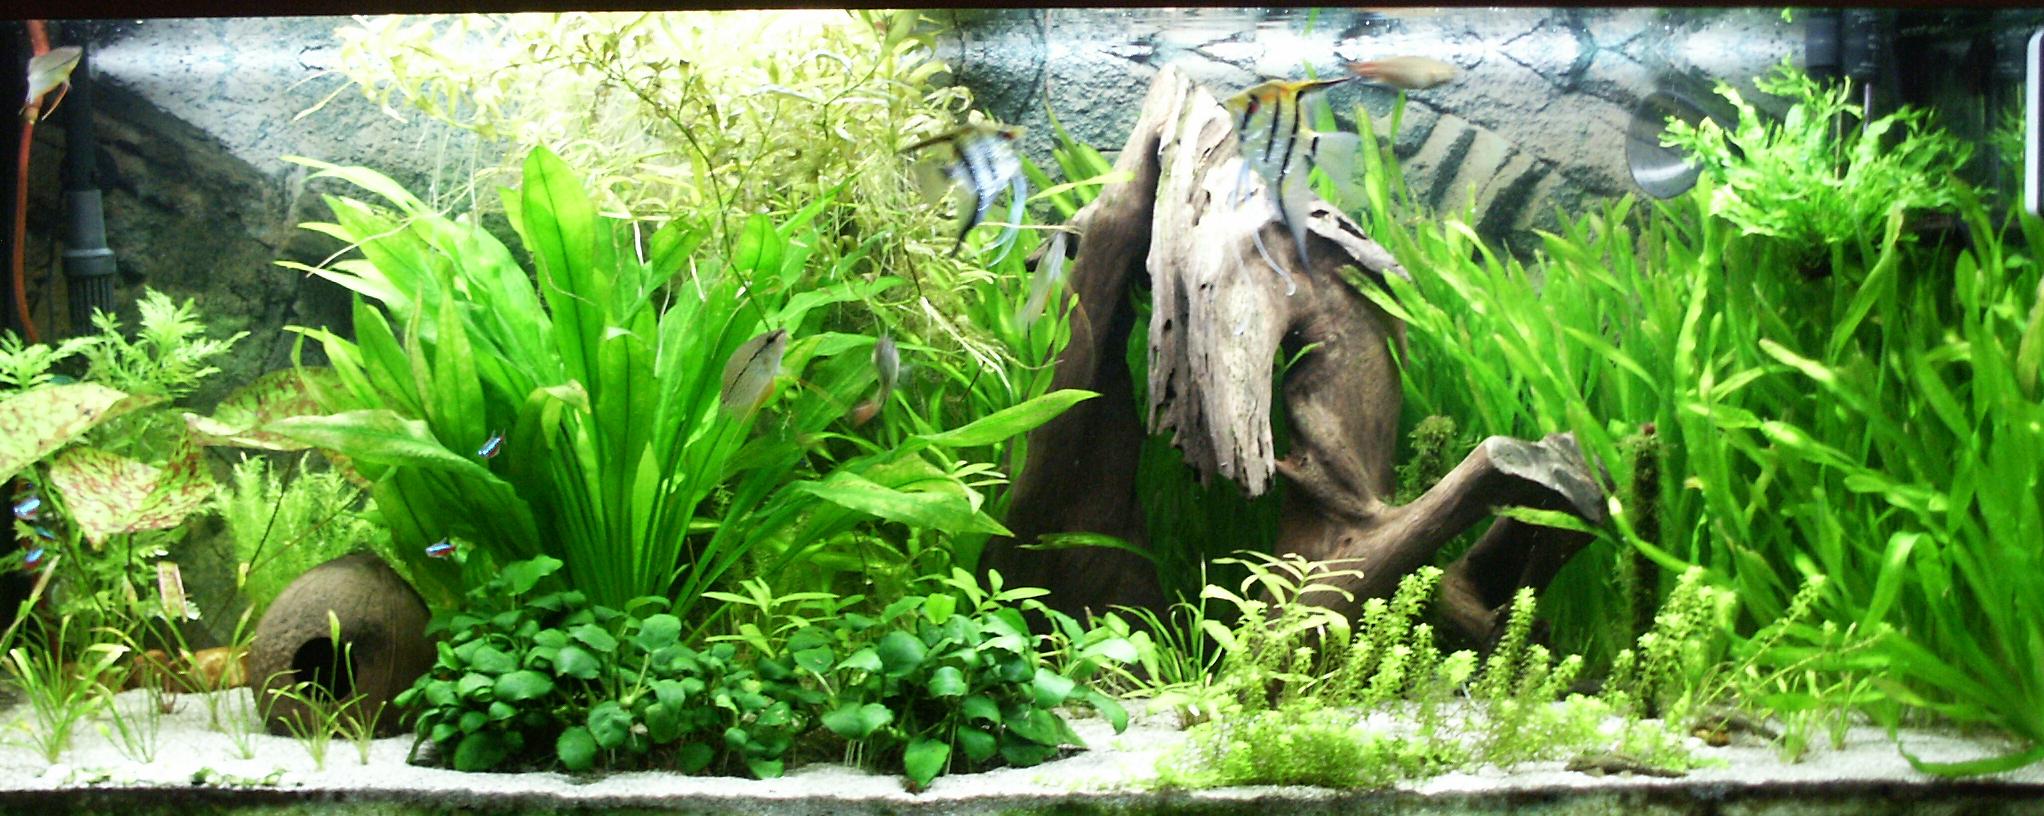 planted angelfish tank | Freshwater Aquarium Plants Create ...